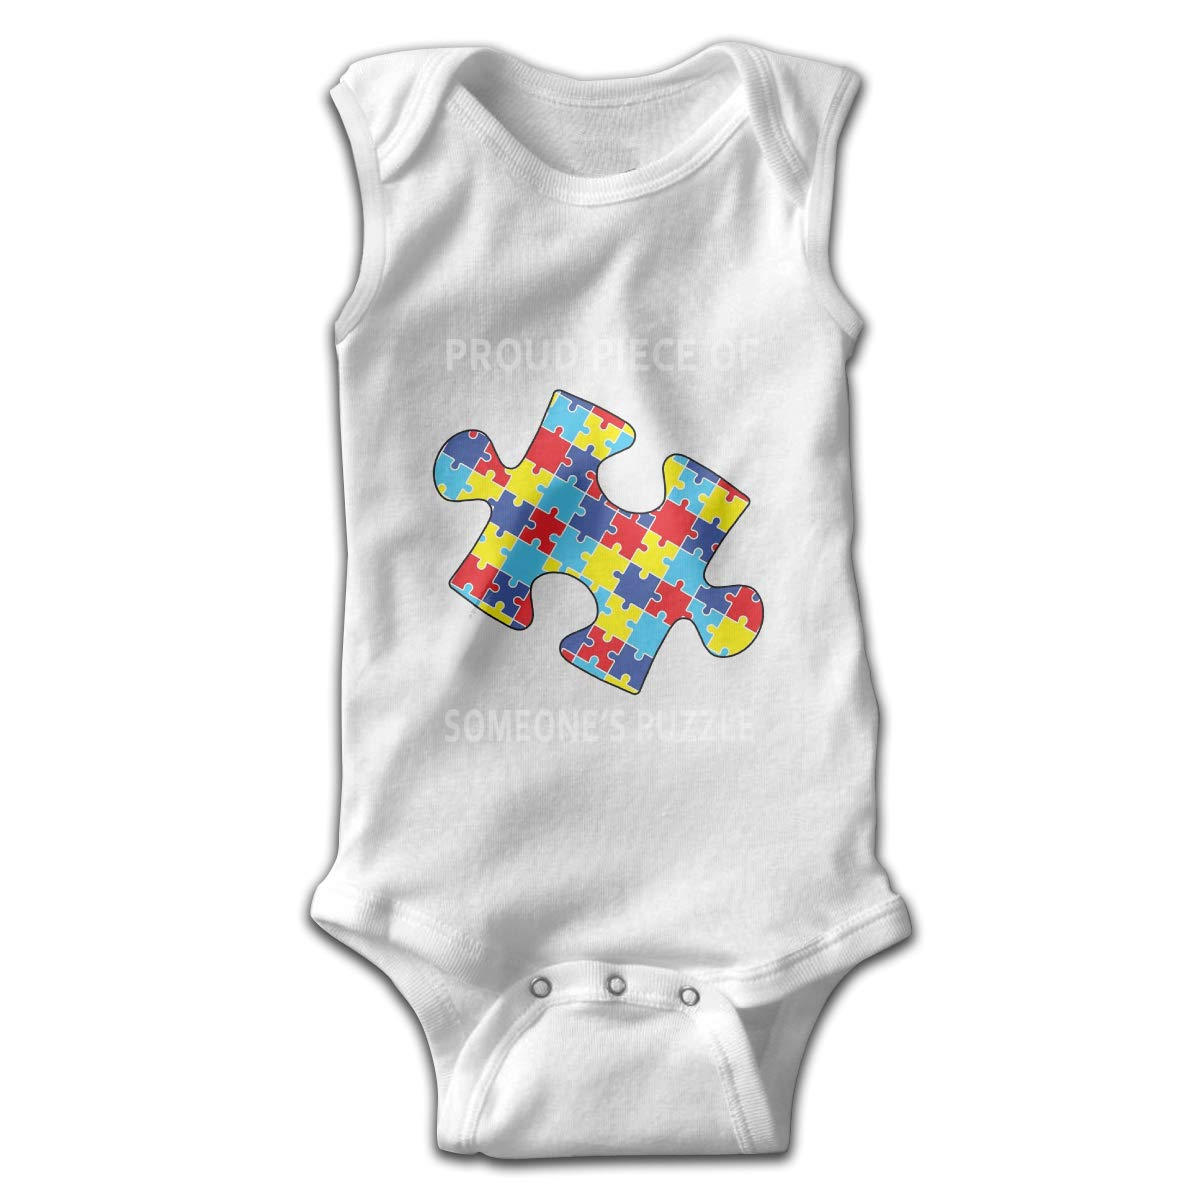 Dunpaiaa Proud Piece of Someones Puzzle Smalls Baby Onesie,Infant Bodysuit Black